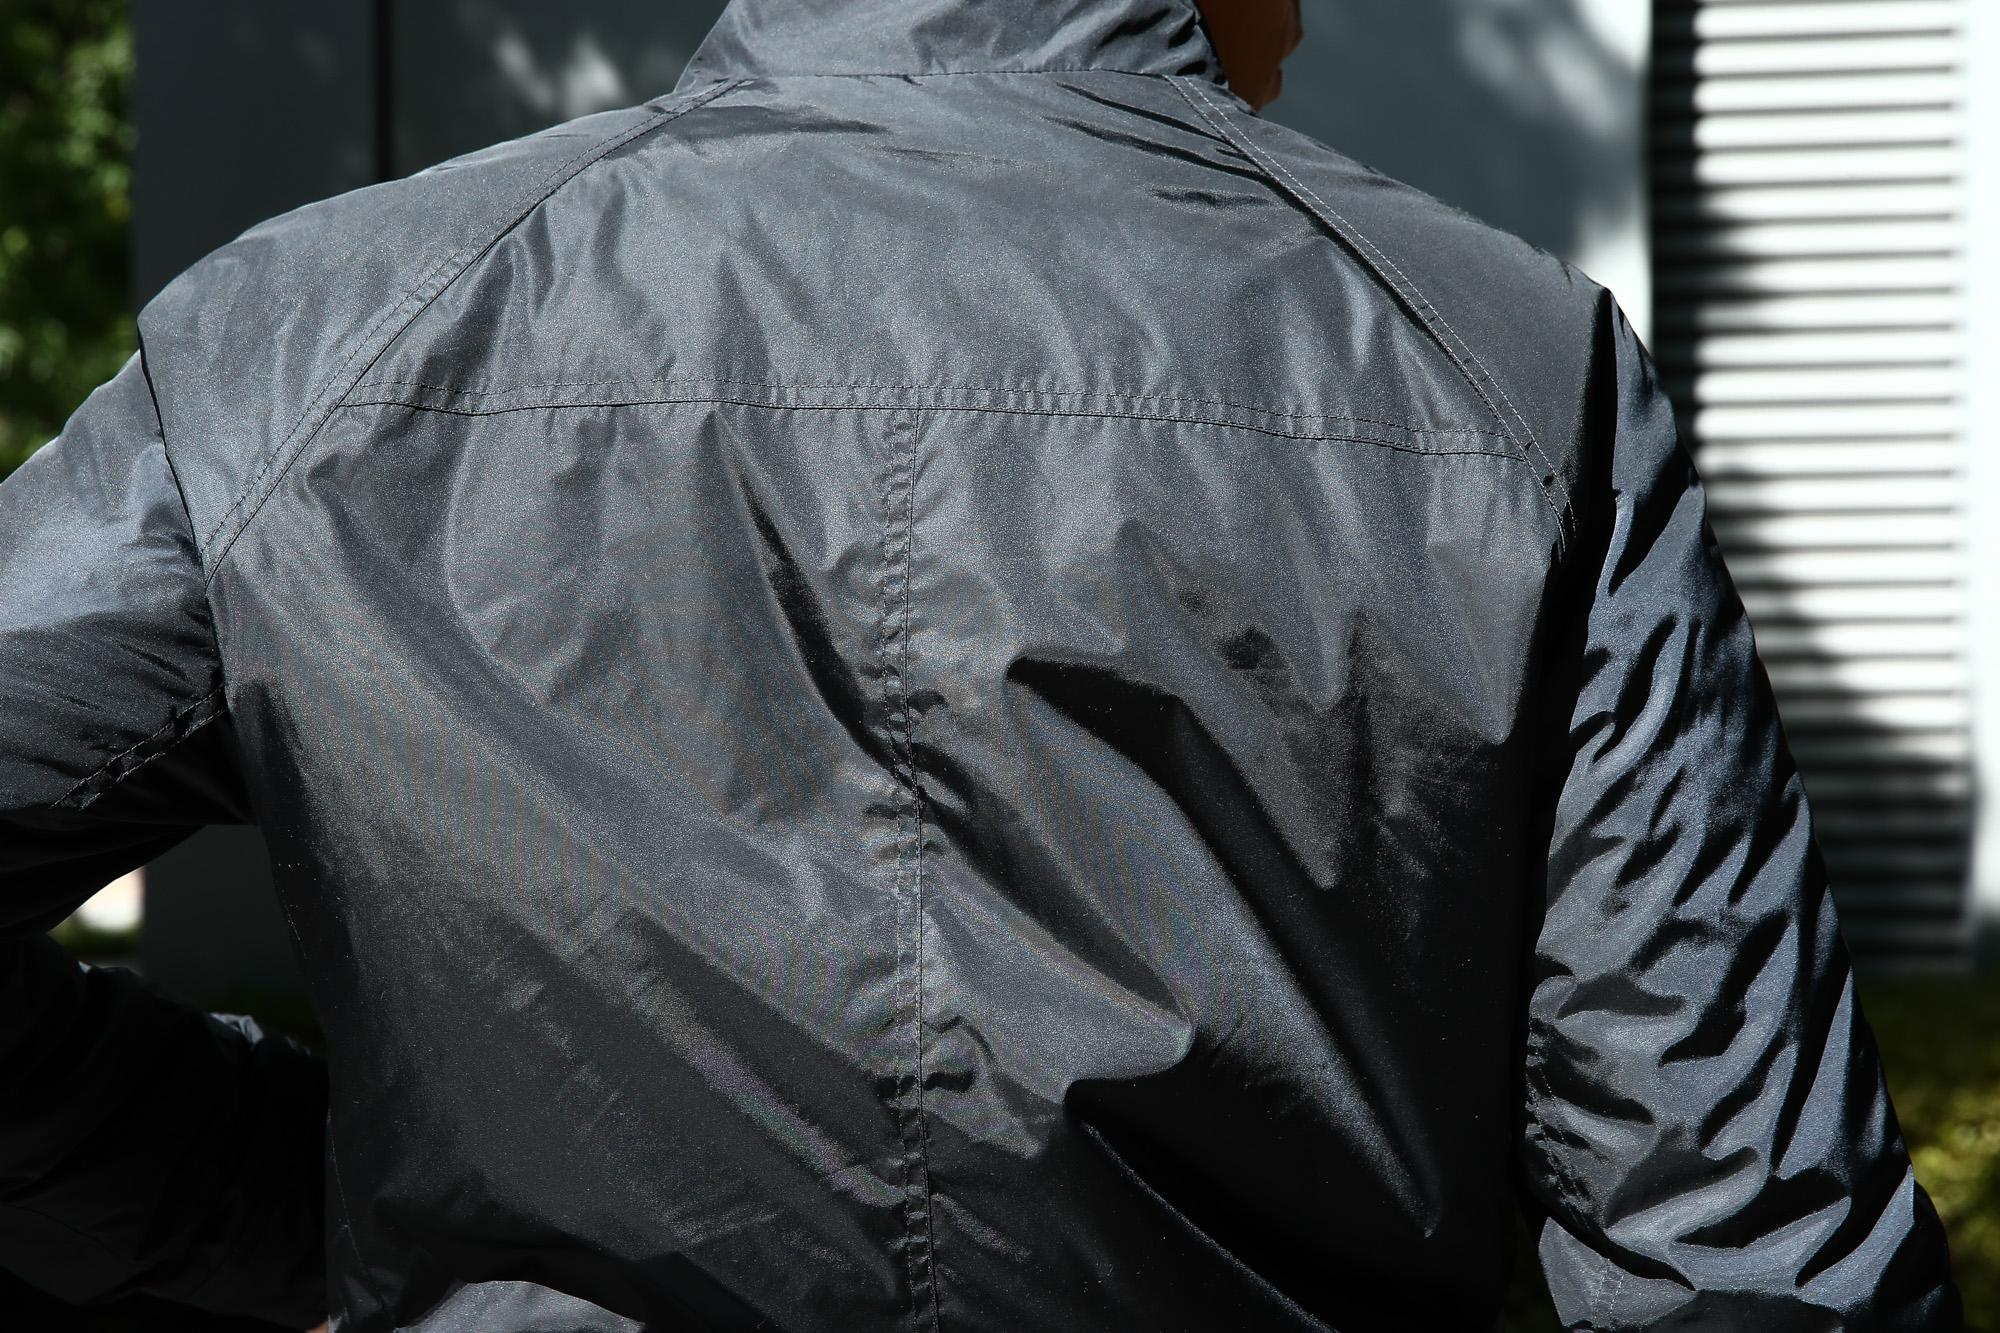 Sealup (シーラップ) Bomber Jacket (ボンバージャケット) 7578 9683 中綿入り ボマージャケット ナイロンジャケット NAVY (ネイビー・01) MADE IN ITALY 2016 秋冬新作 愛知 名古屋 Alto e Diritto アルト エ デリット ボマージャケット 紺